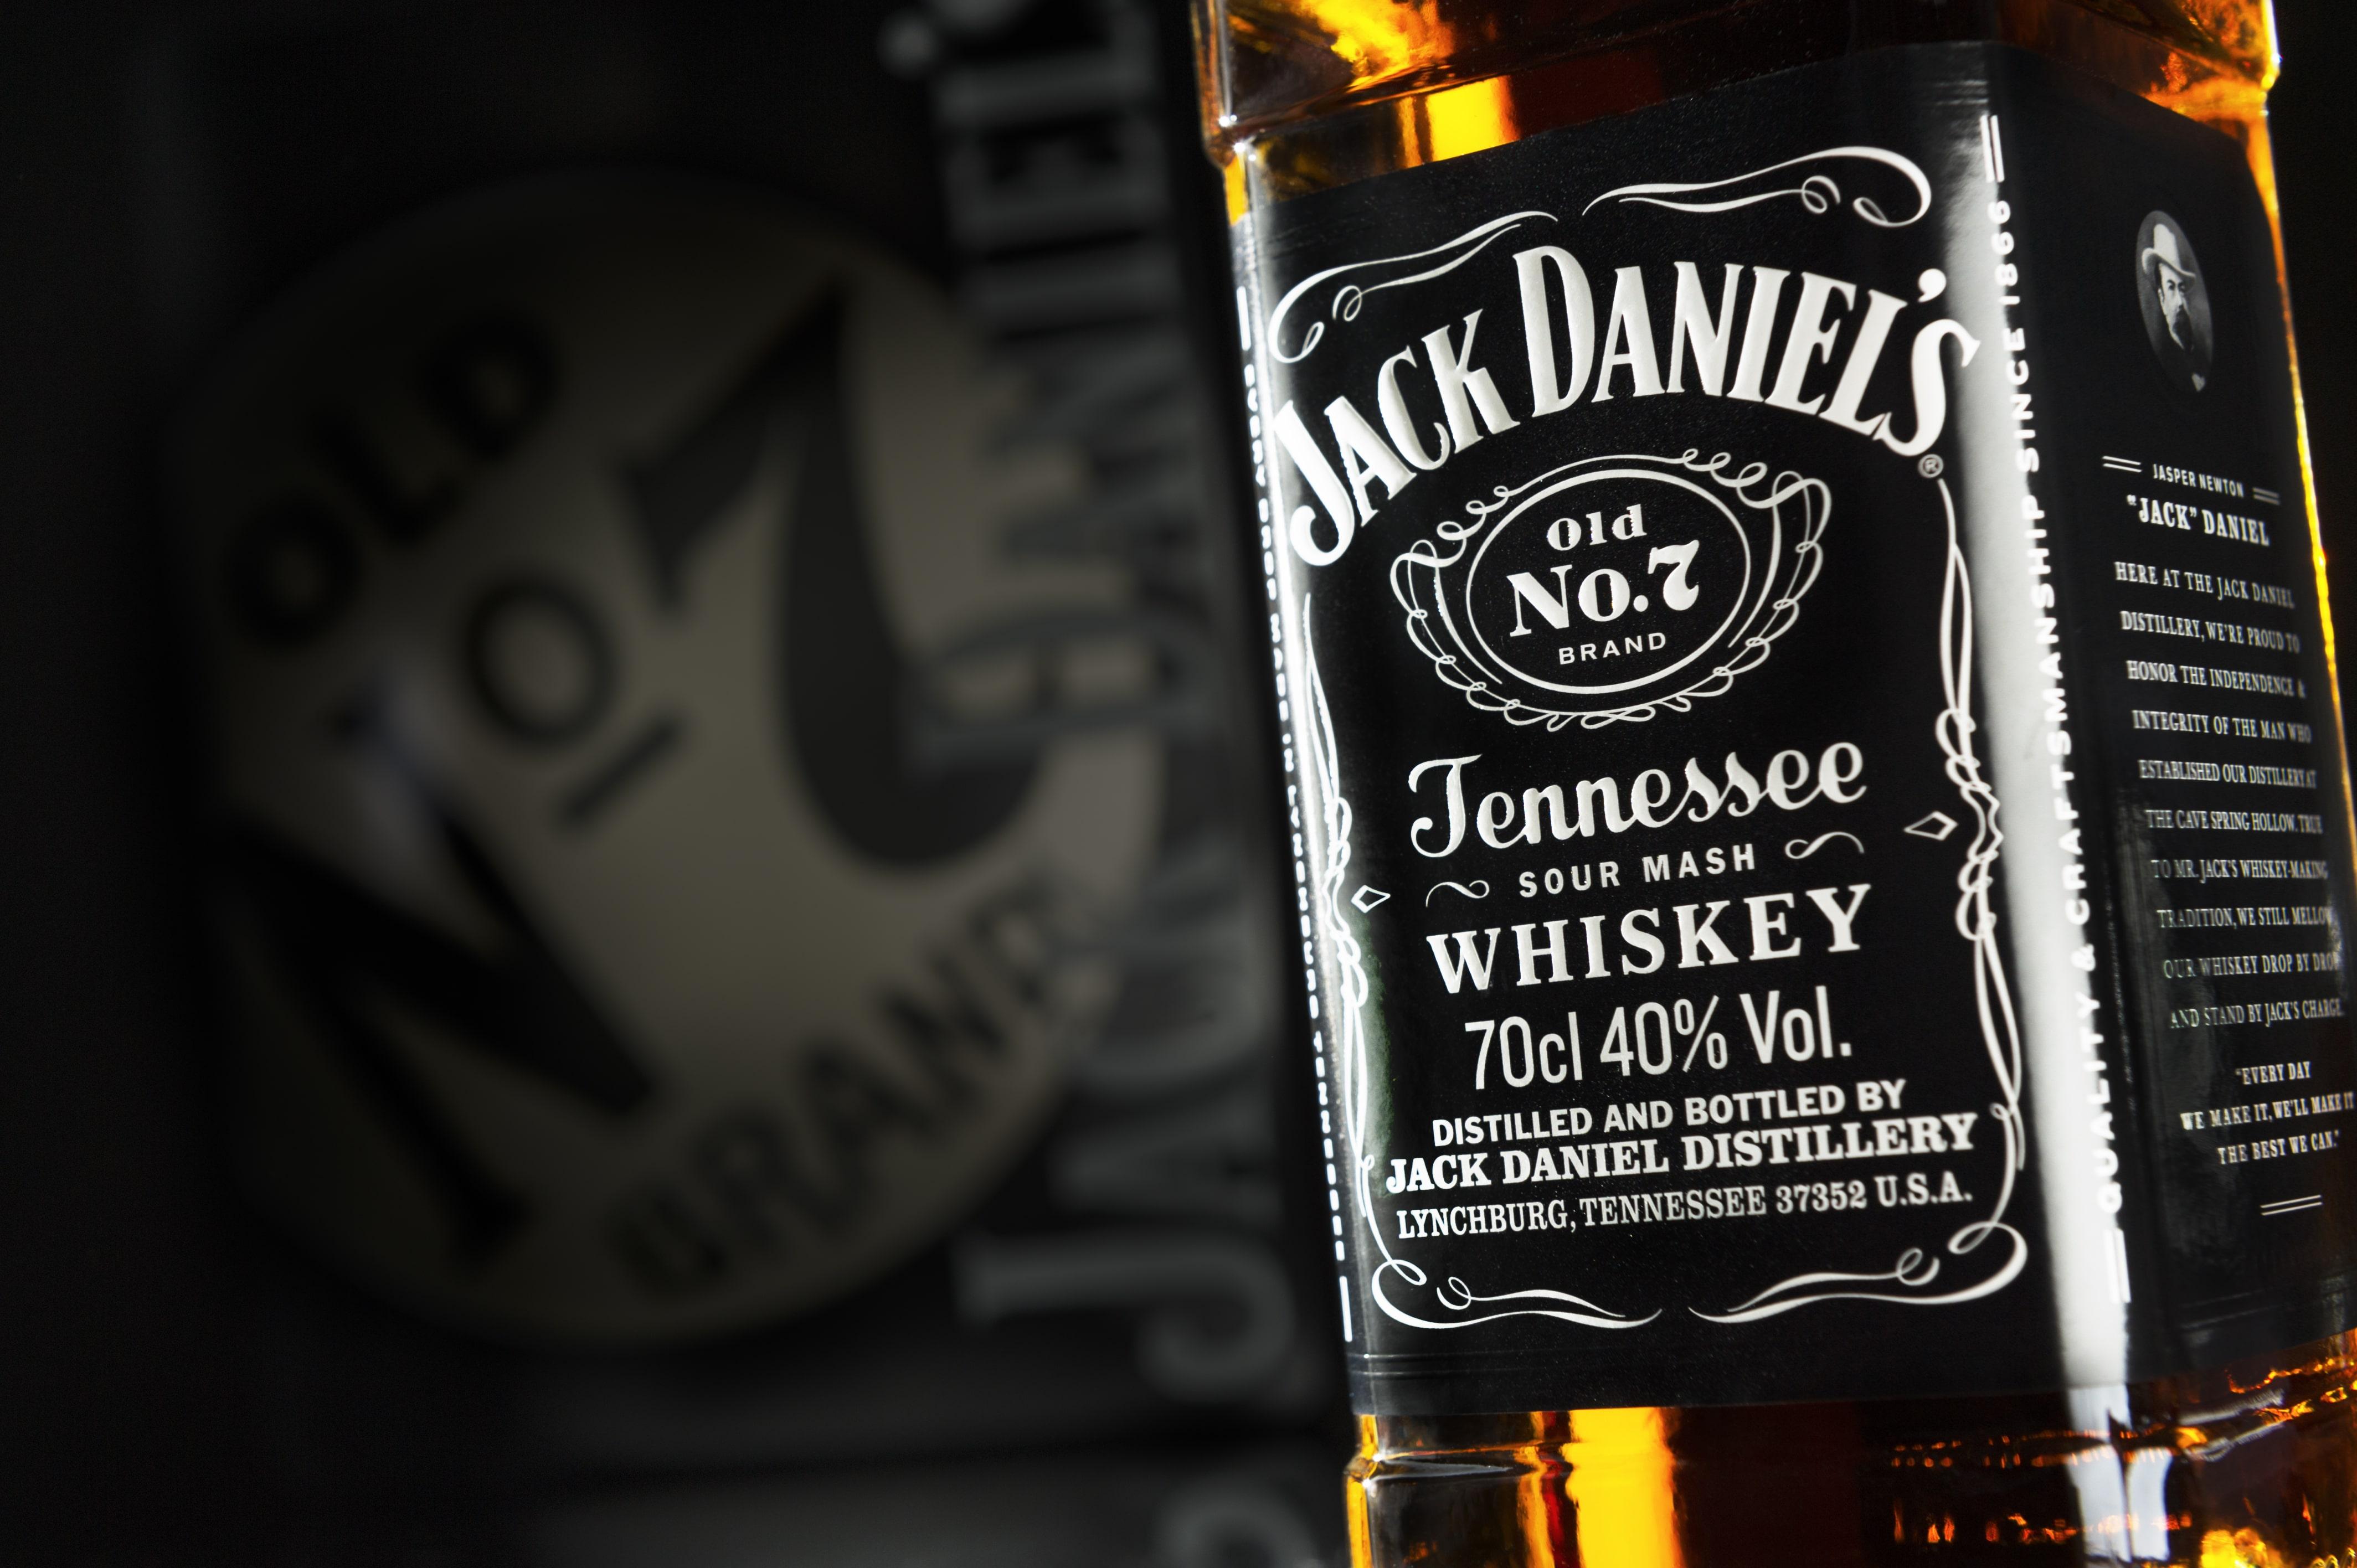 Jack Daniels Background